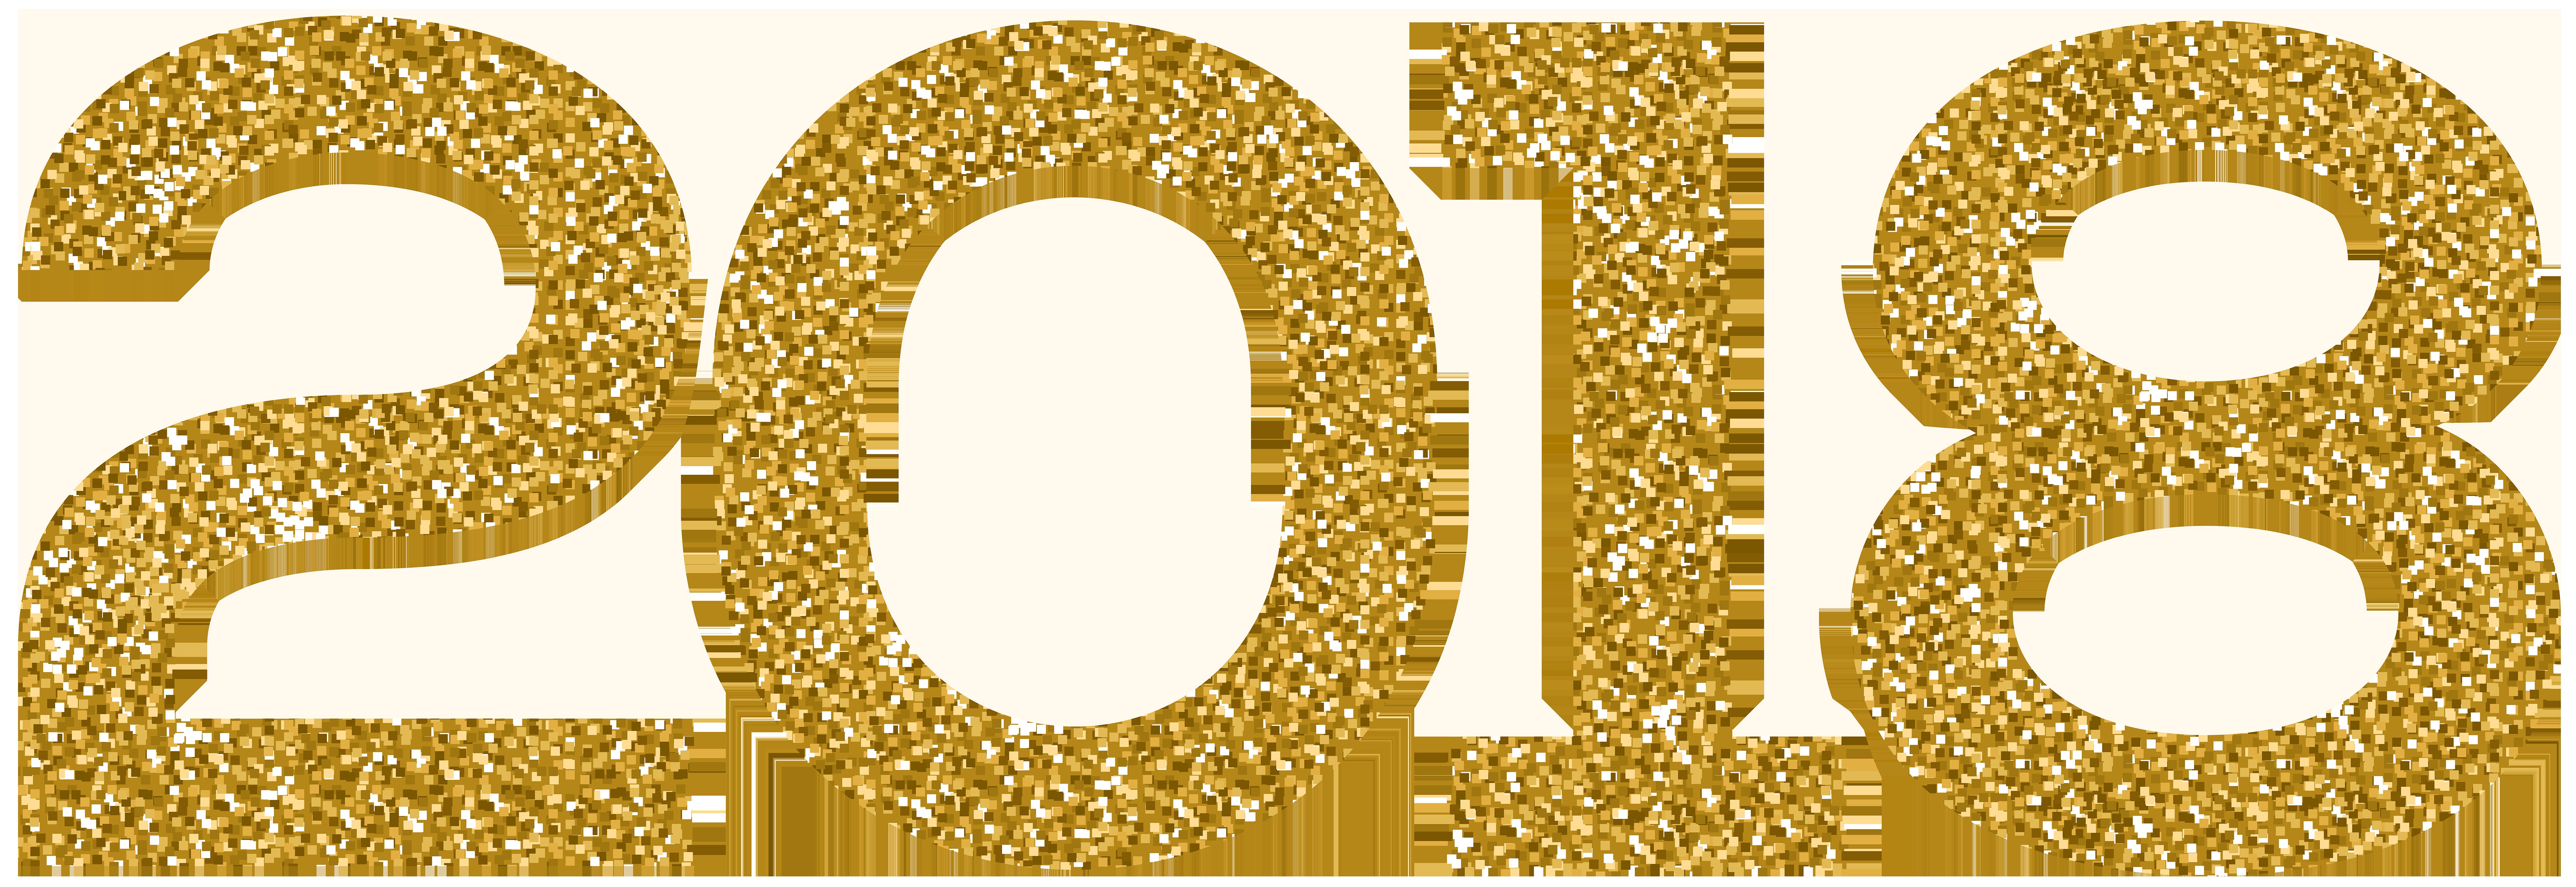 2018 Gold Clip Art PNG Image.